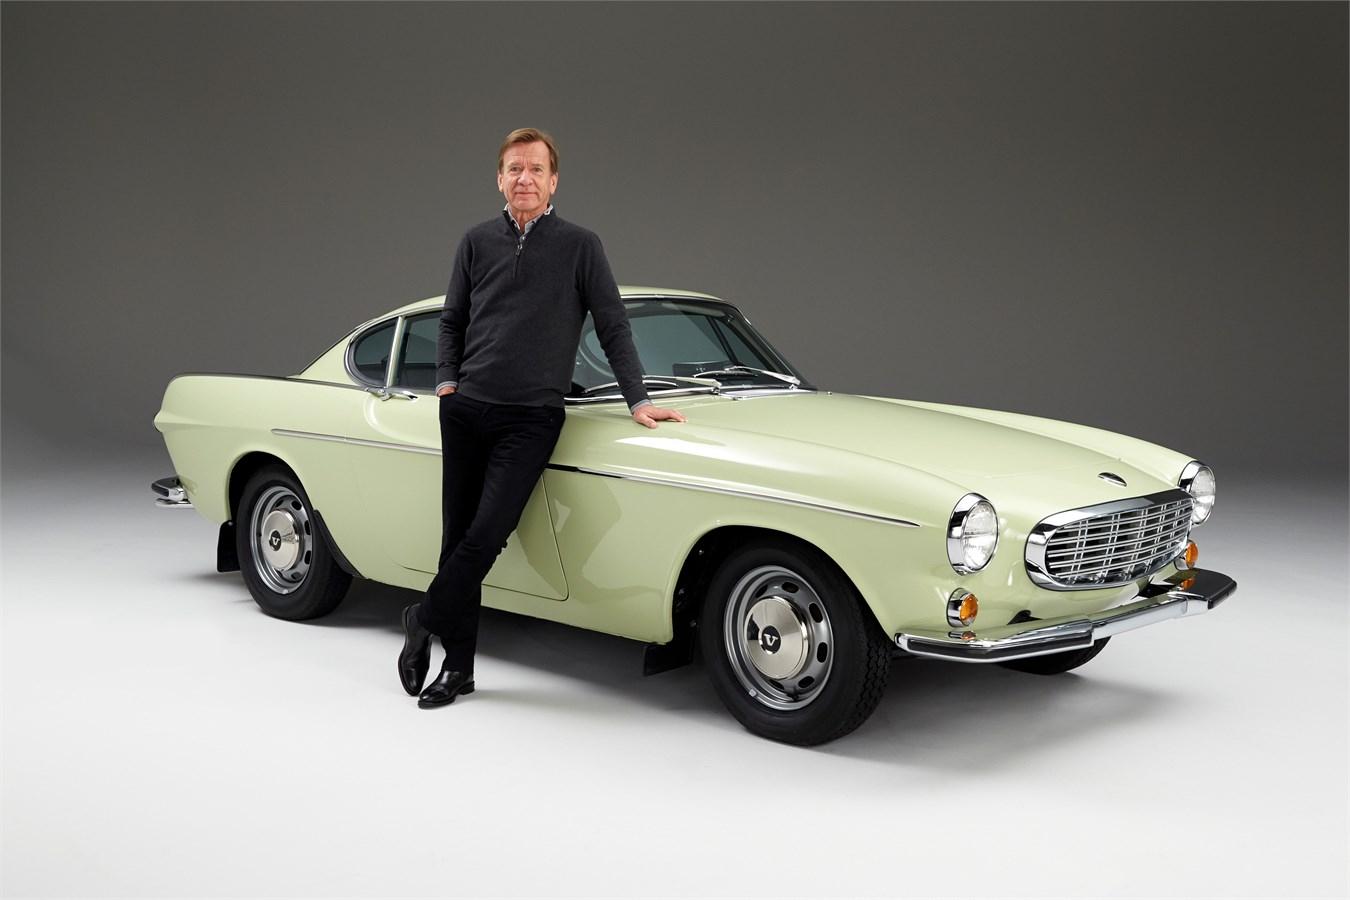 Hakam Samuelsson Volvo